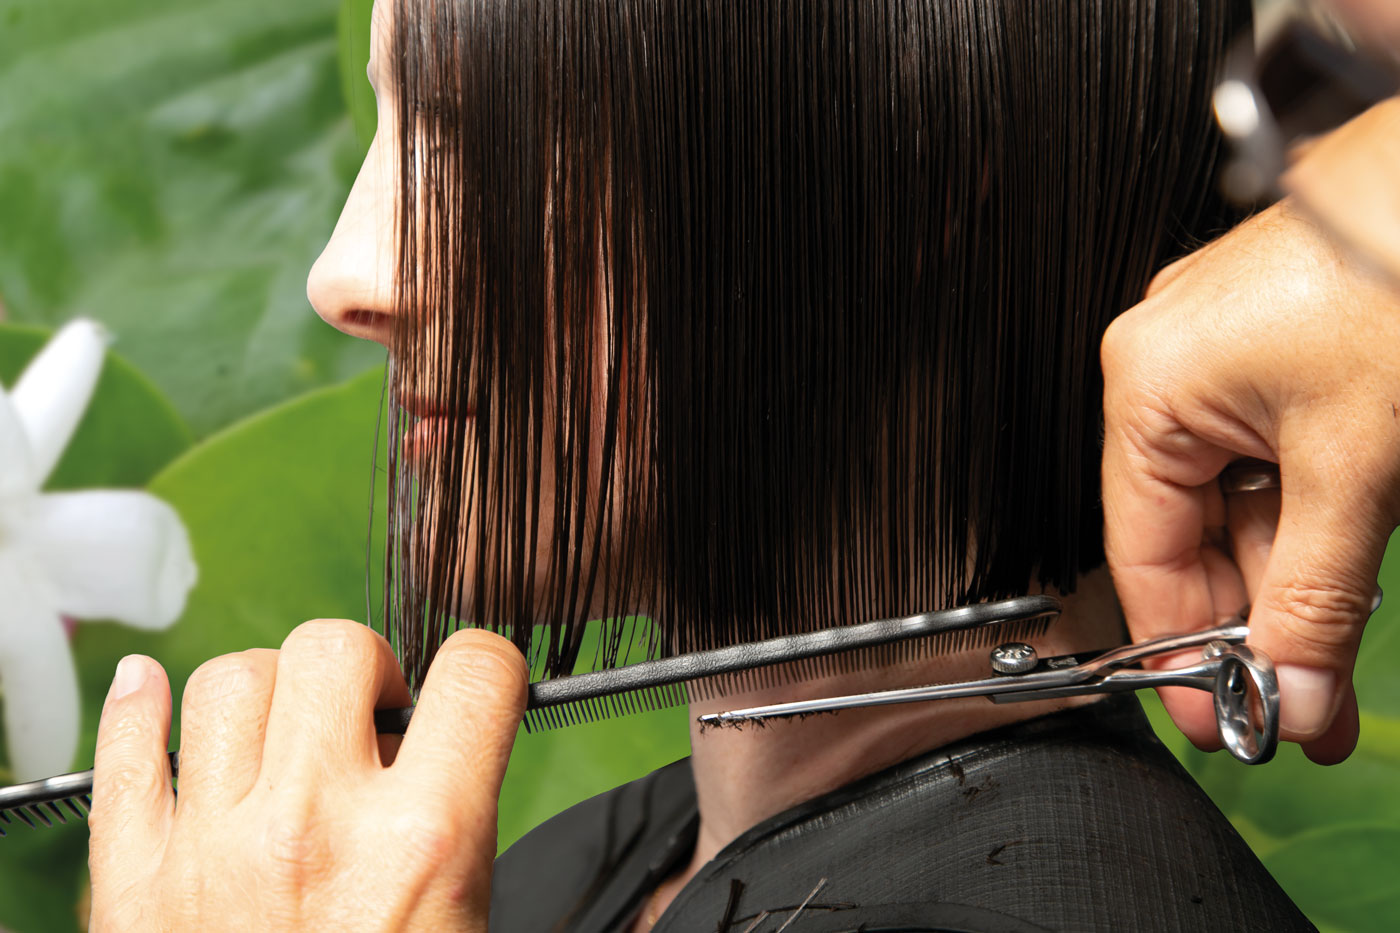 Peter Ziegler* Haarschnitte - Manueller Schnitt